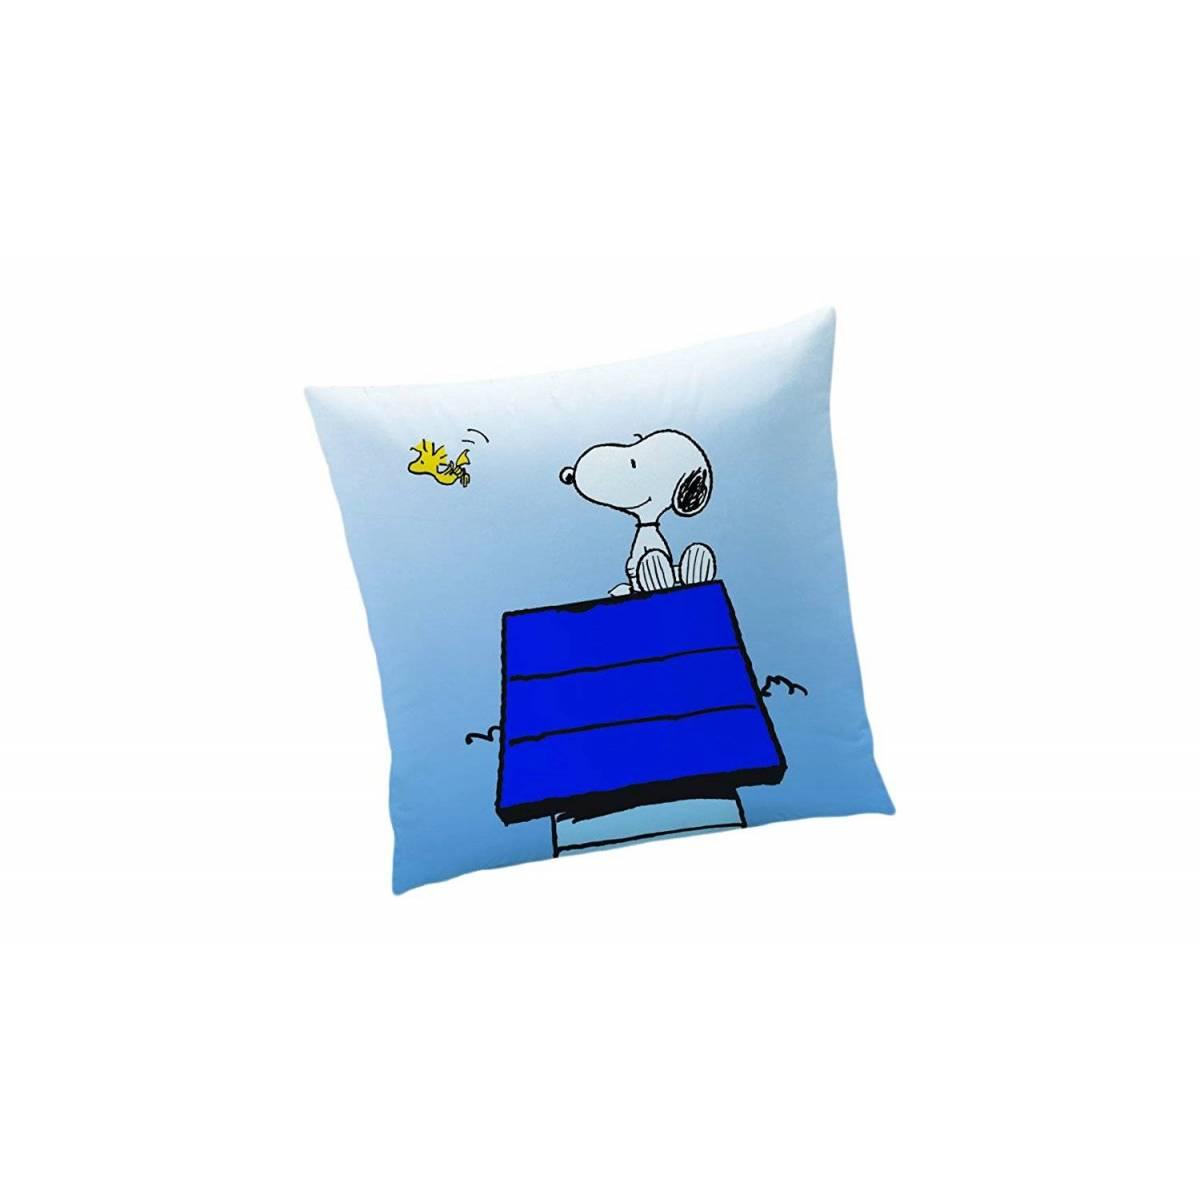 Snoopy - Coussin Coton Bleu - Wake Up - 40 x 40 cm